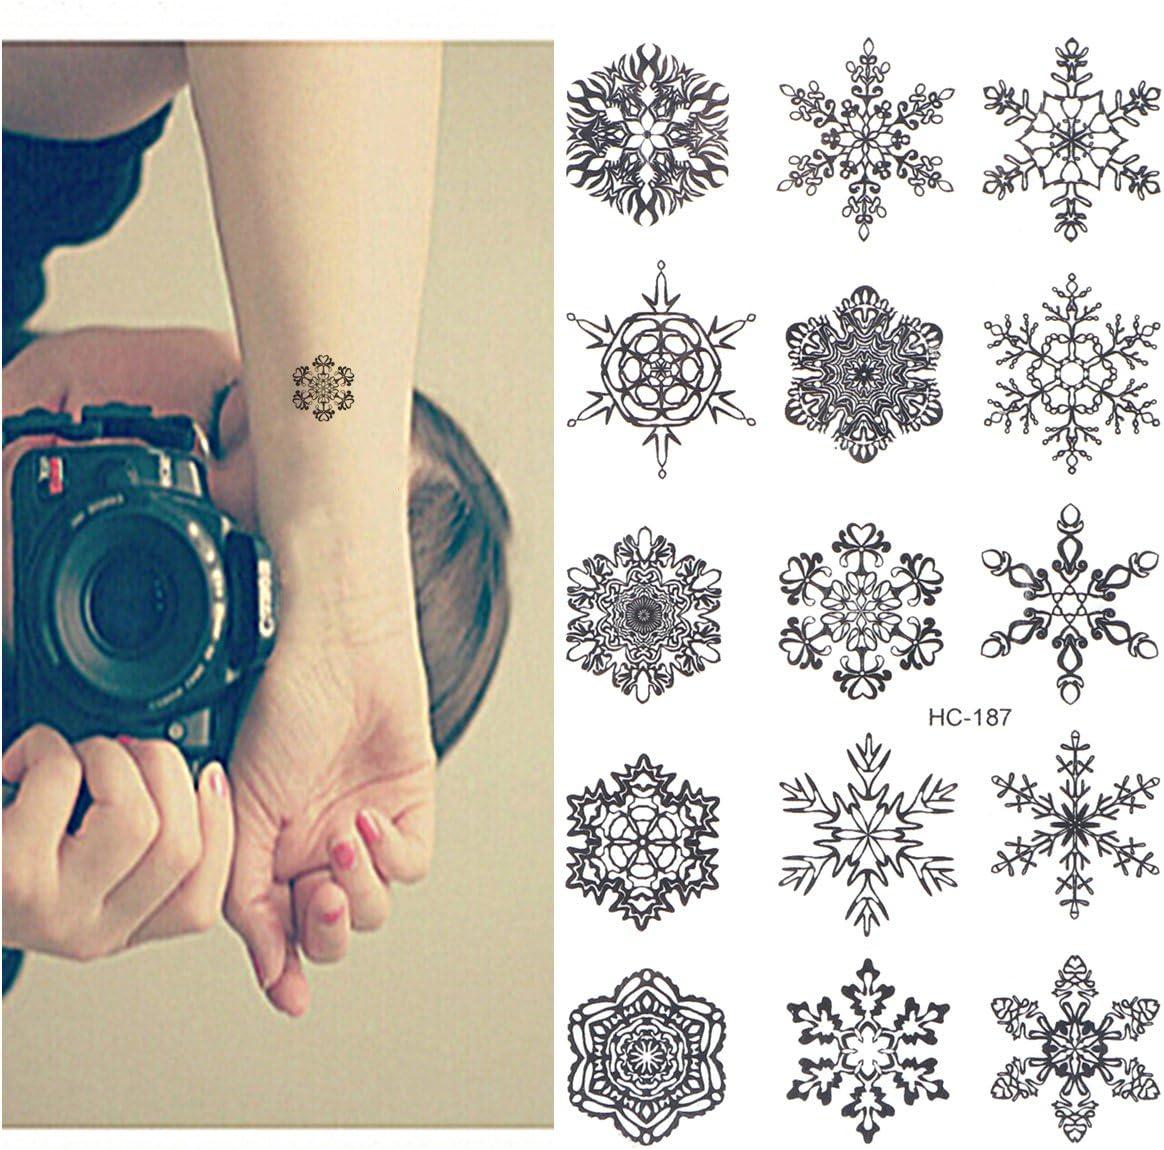 Tinksky Tatuajes Temporales Negro Copos de Nieve Stickers ...